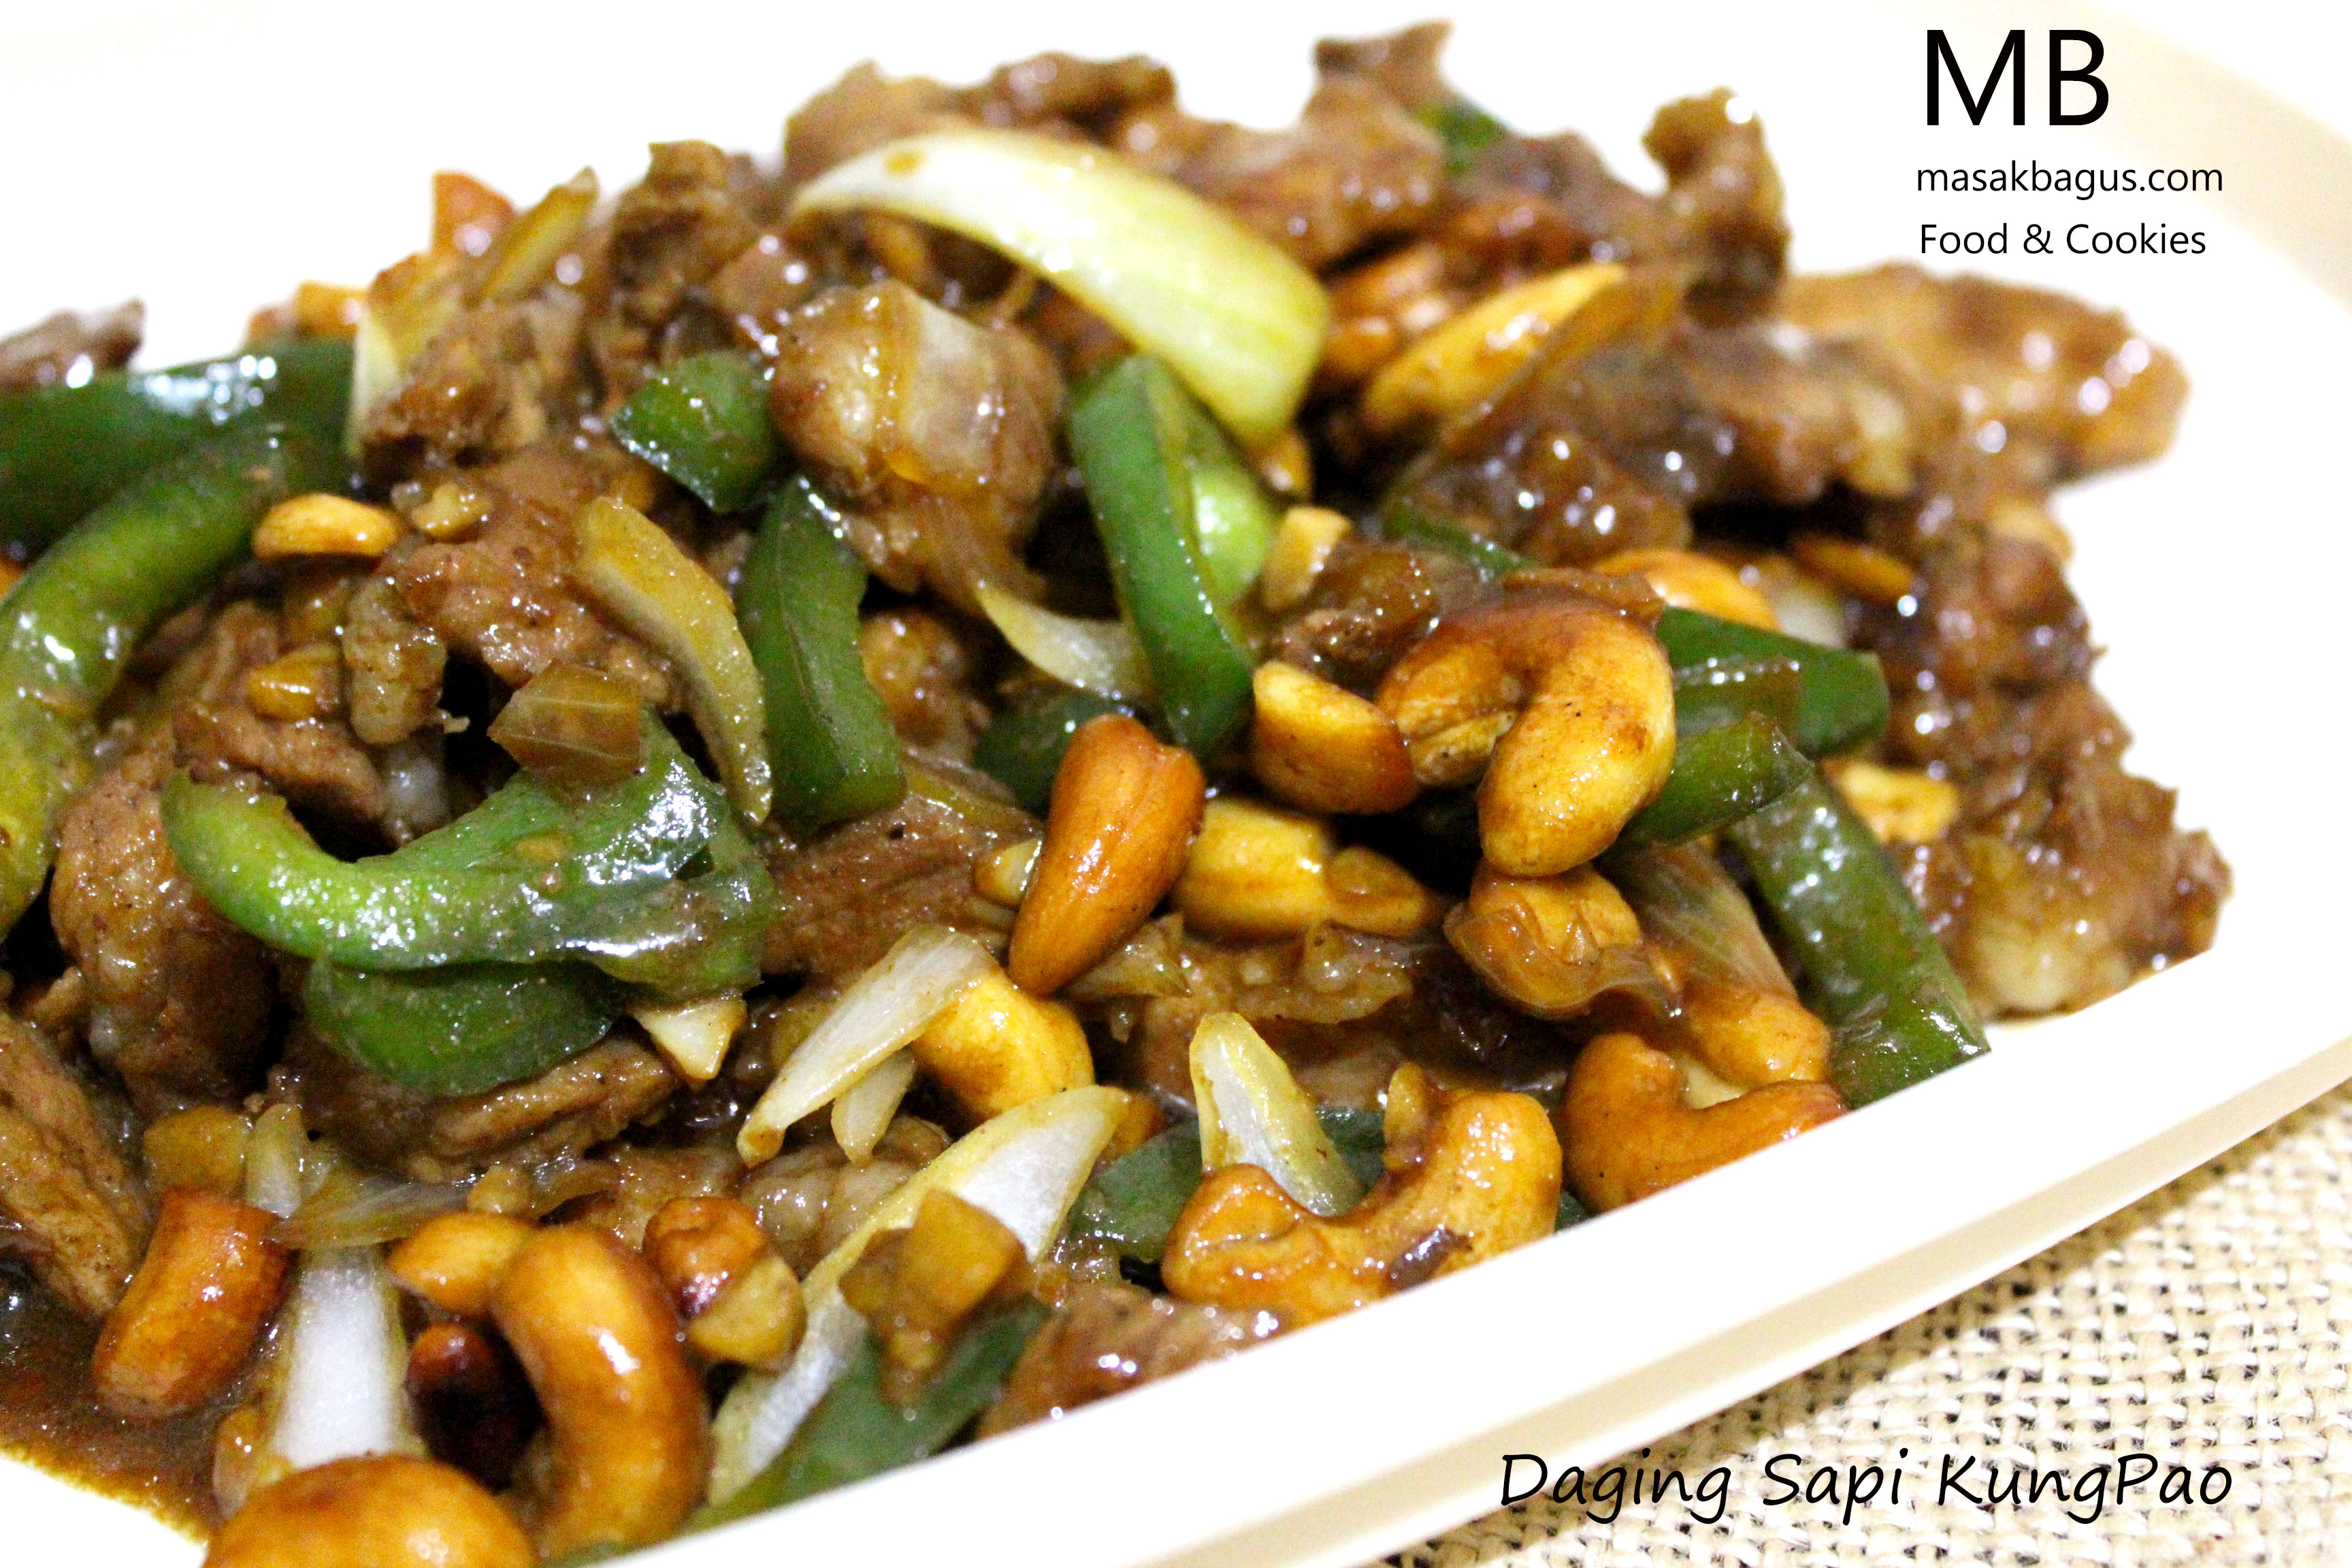 daging sapi kungpao